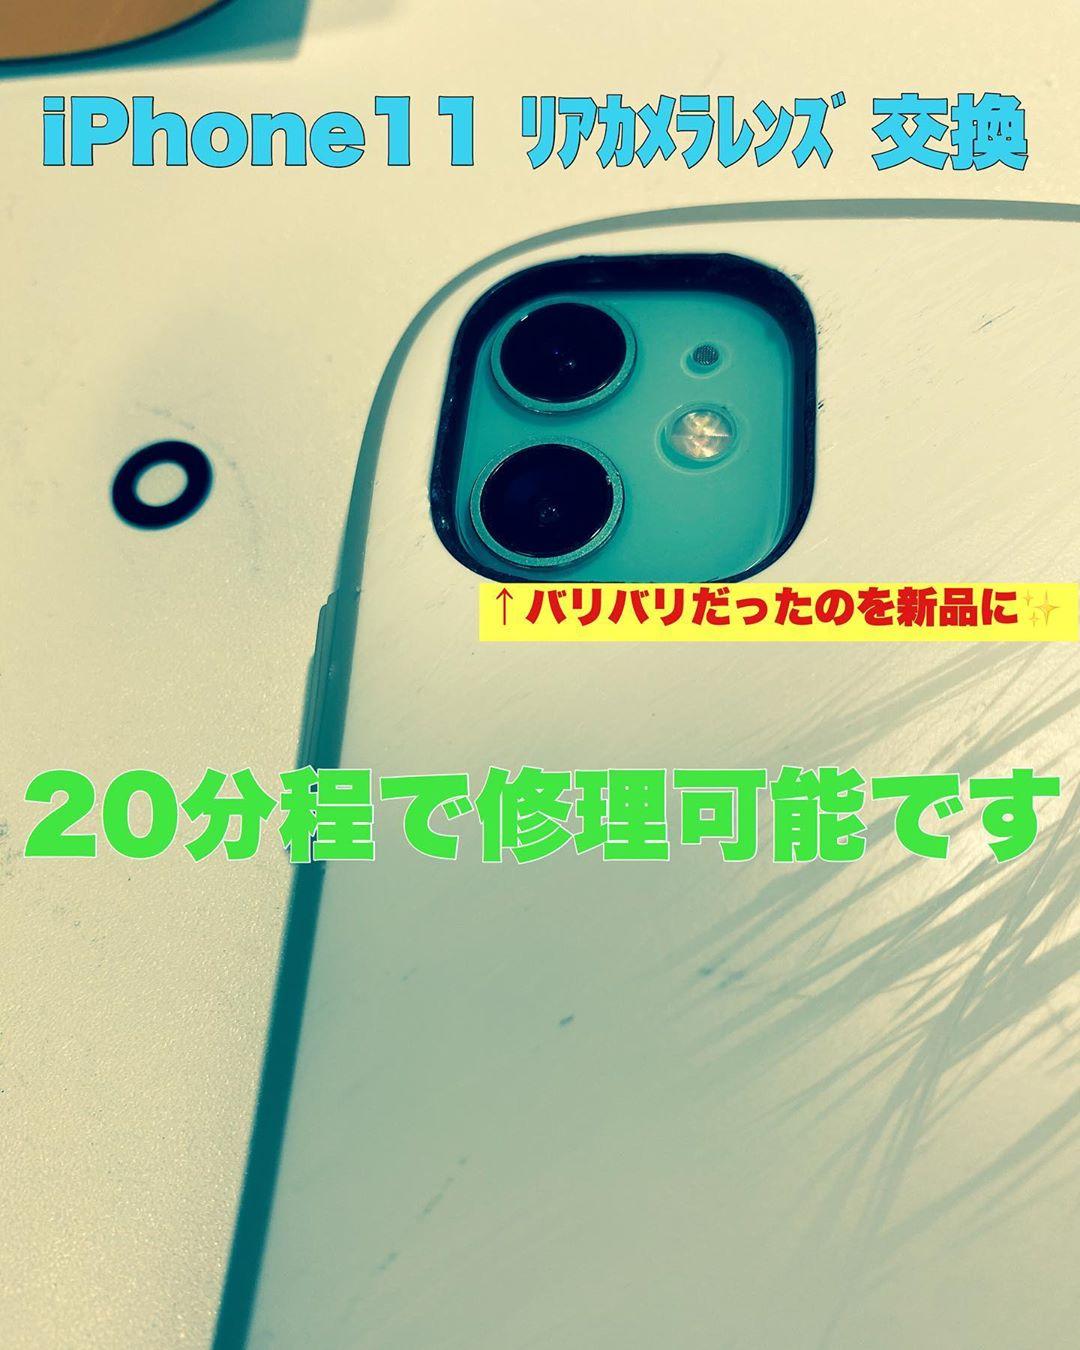 iPhone11 カメラレンズ交換 Vision江南駅前店